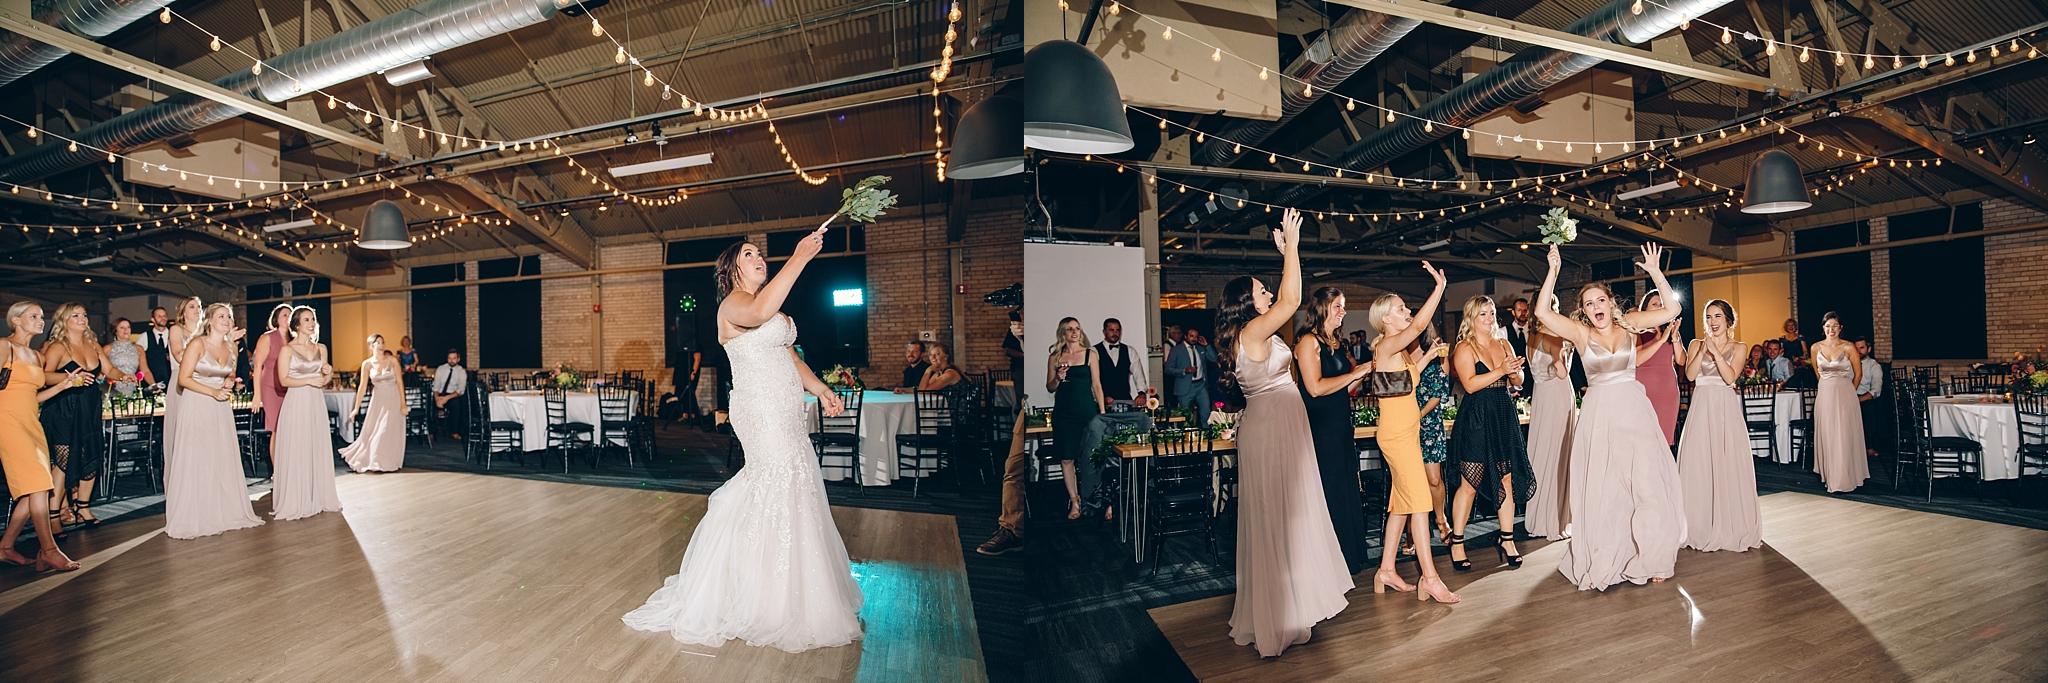 baker-lofts-holland-michigan-wedding-photographer_0412.jpg